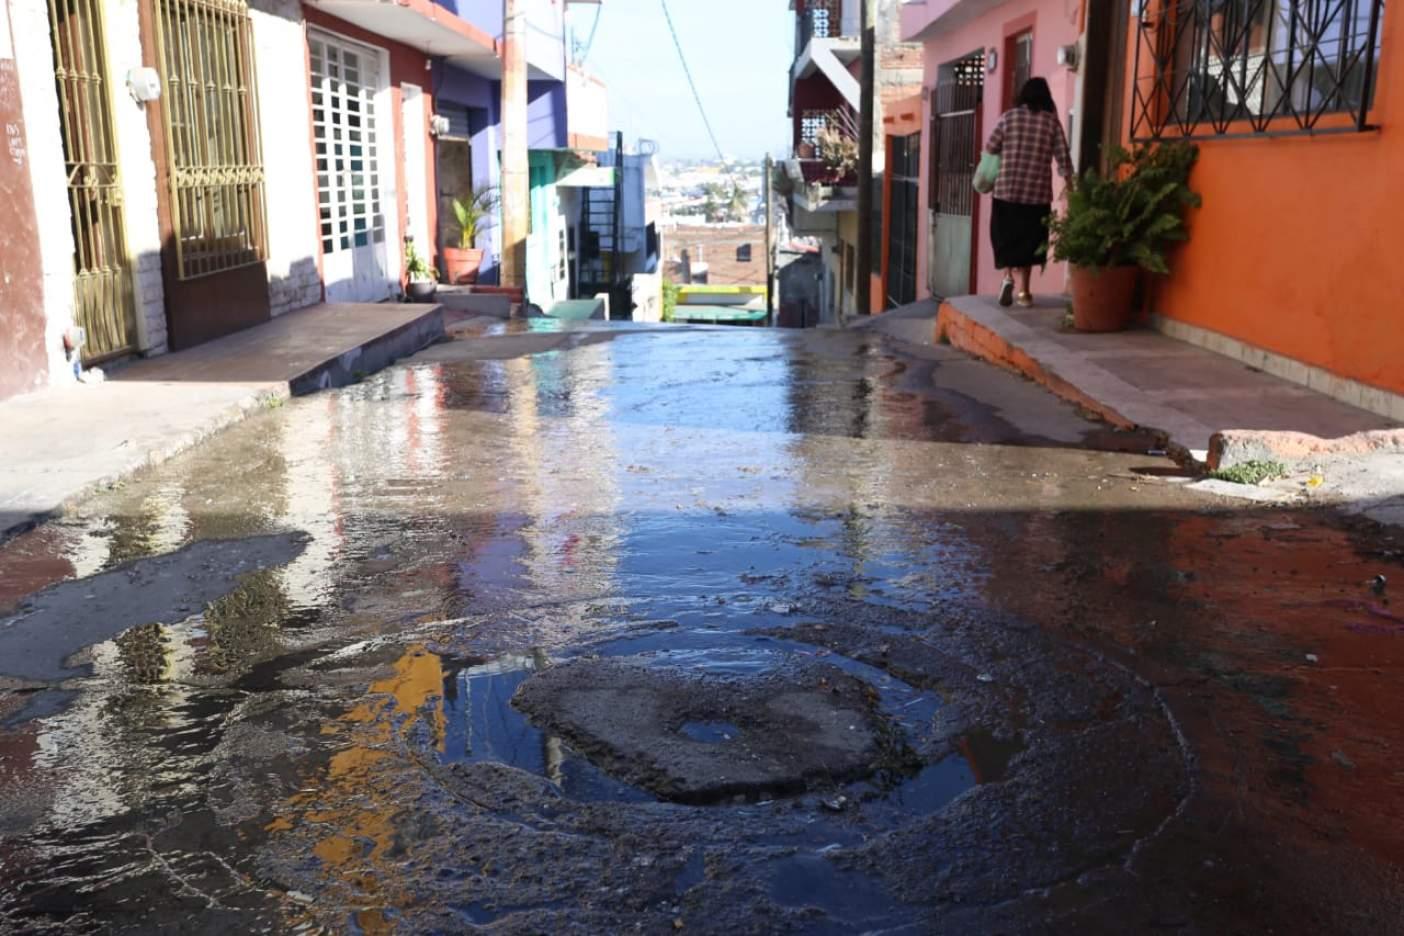 Sinaloa: Fugas golpean el suministro de agua en Mazatlán (El Sol de Mazatlán)